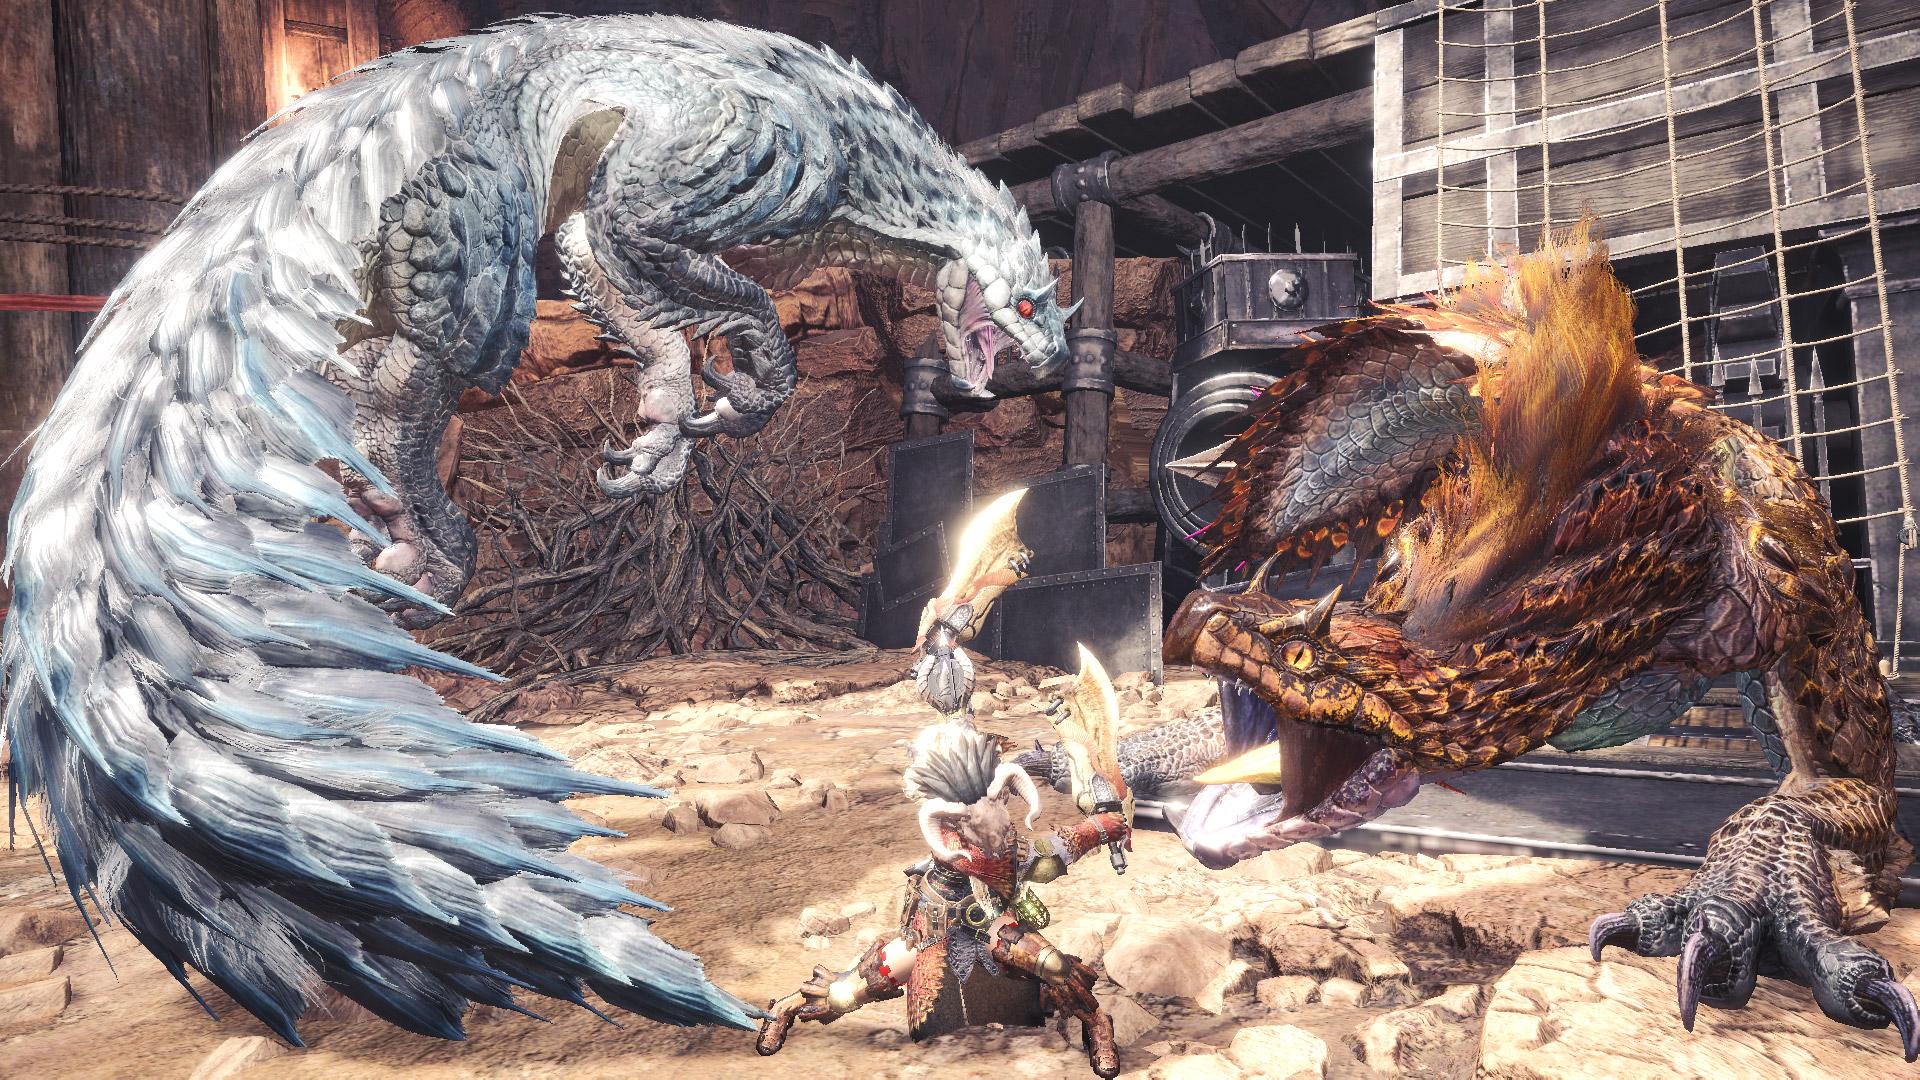 Monster Hunter World: Iceborne ships 2.5 million units during launch week screenshot